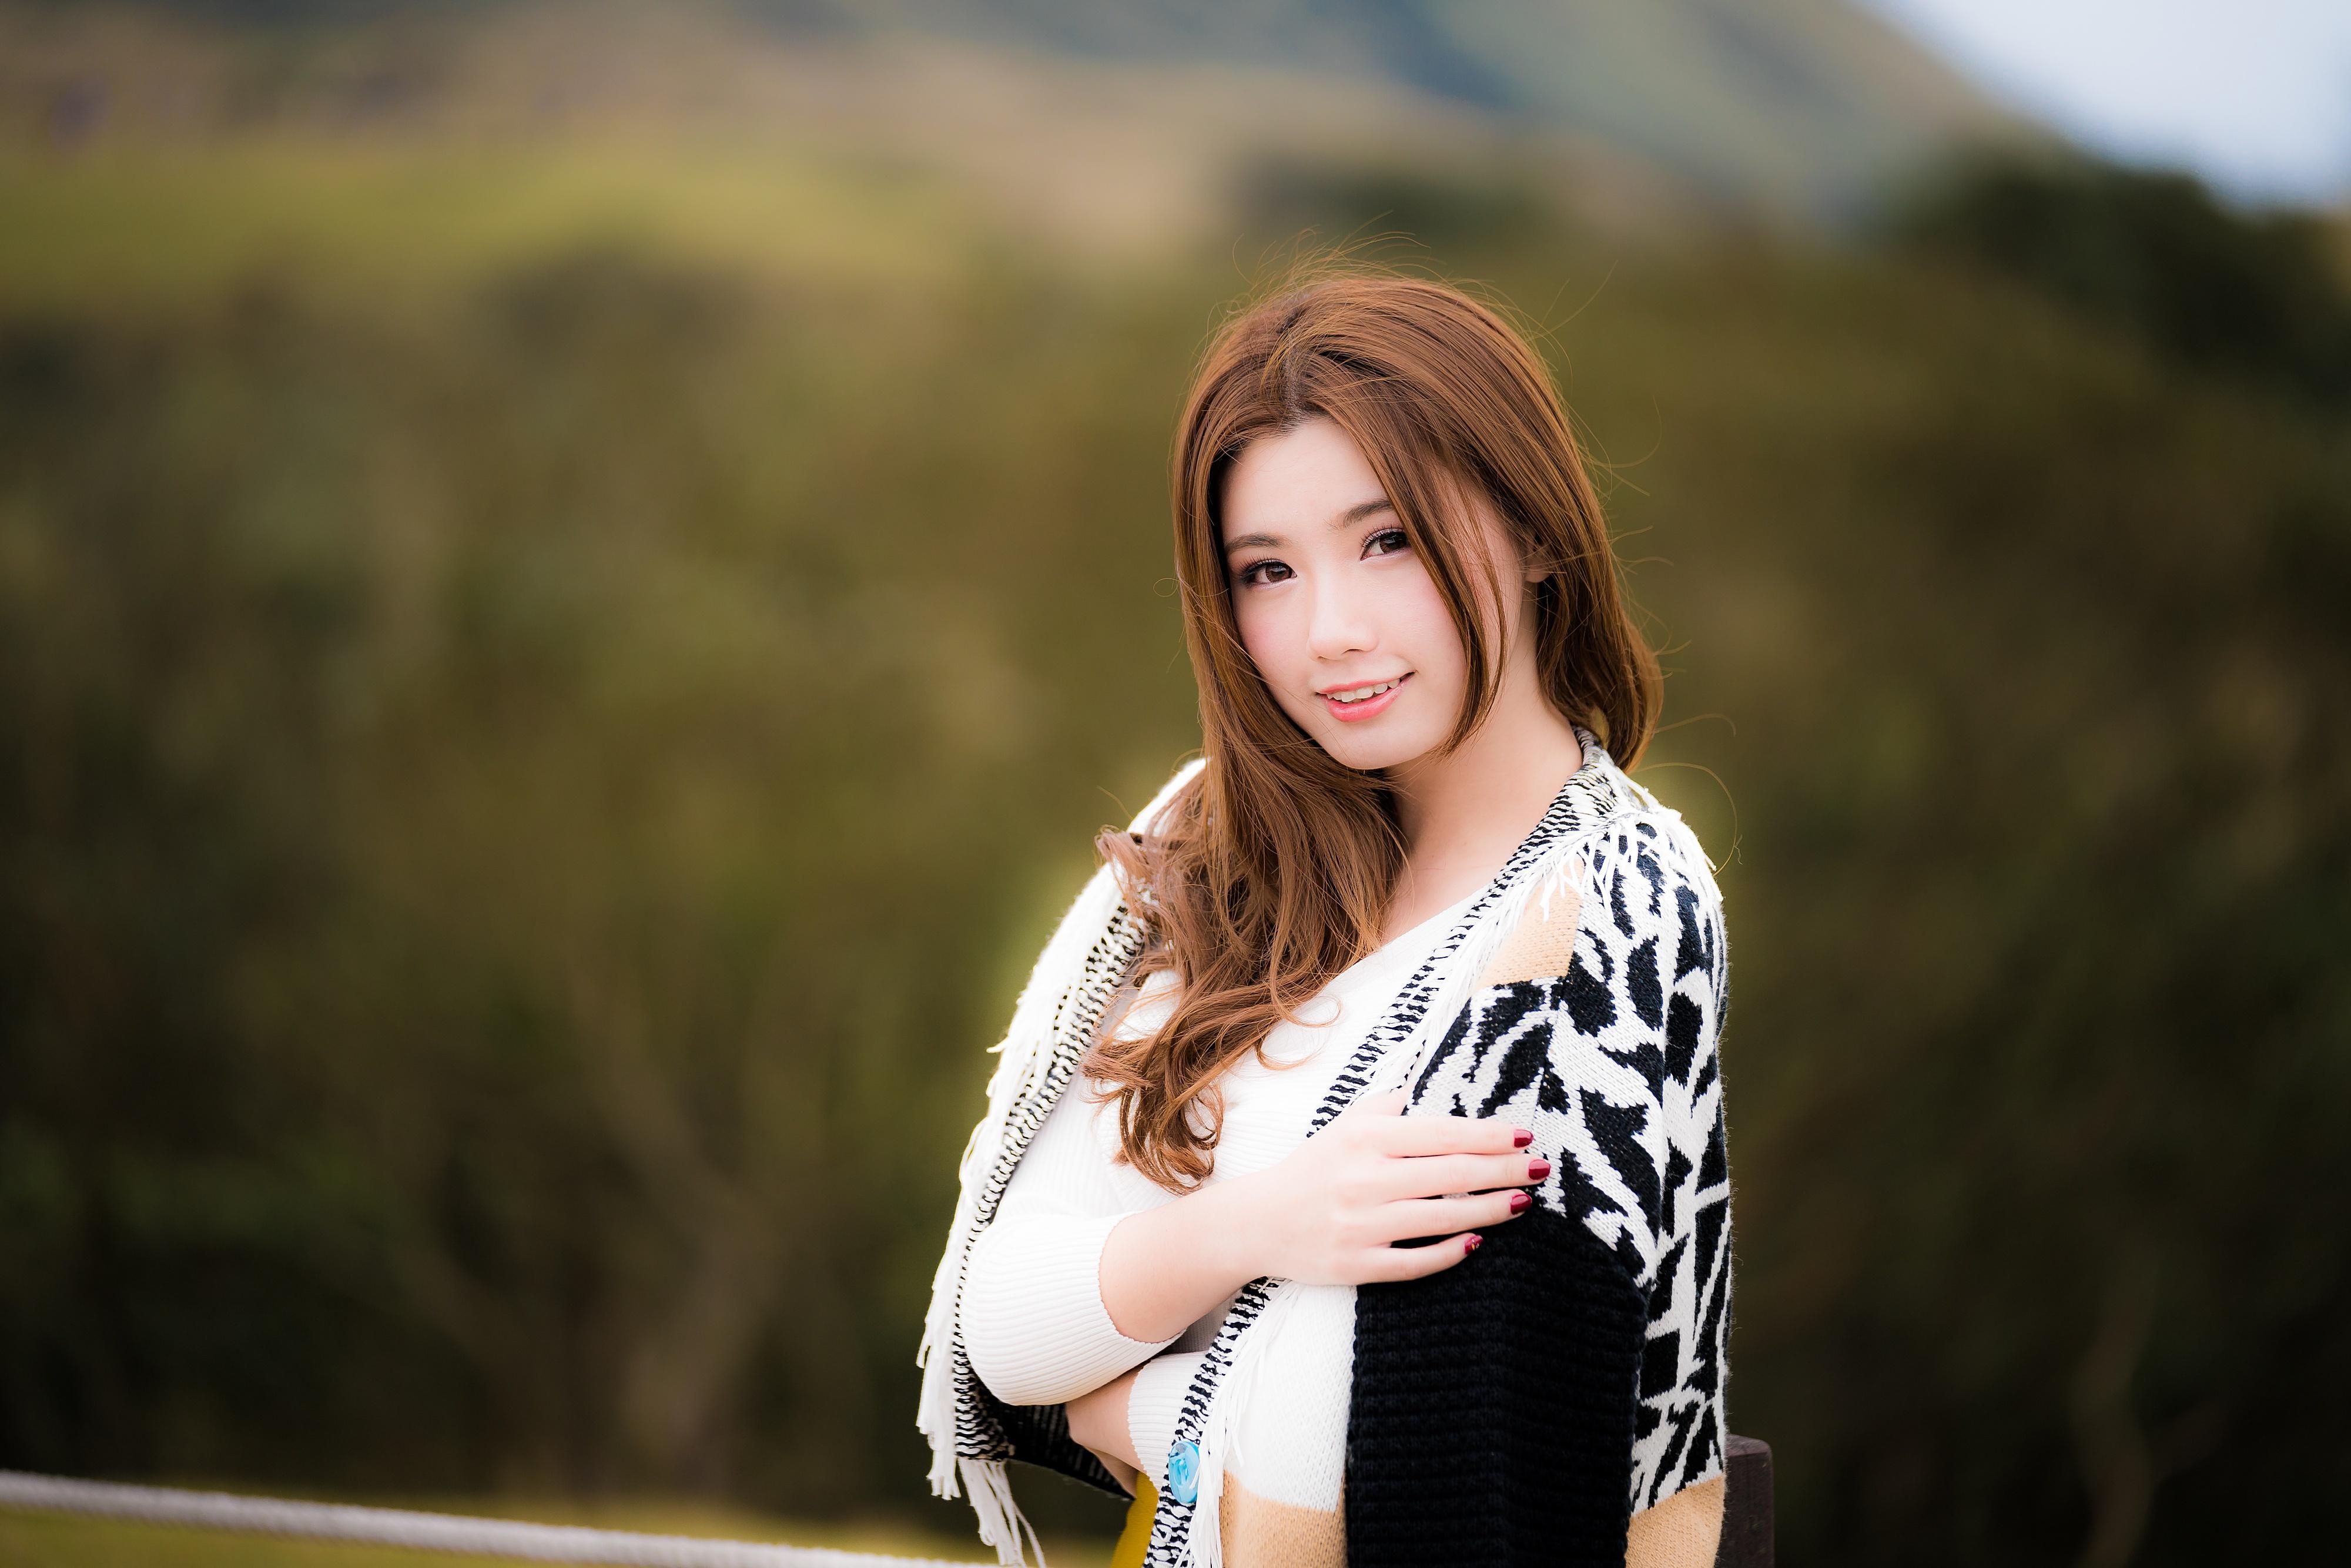 Bilder på skrivbordet Brunhårig tjej suddig bakgrund Unga kvinnor asiatisk Händer ser Bokeh ung kvinna Asiater hand Blick